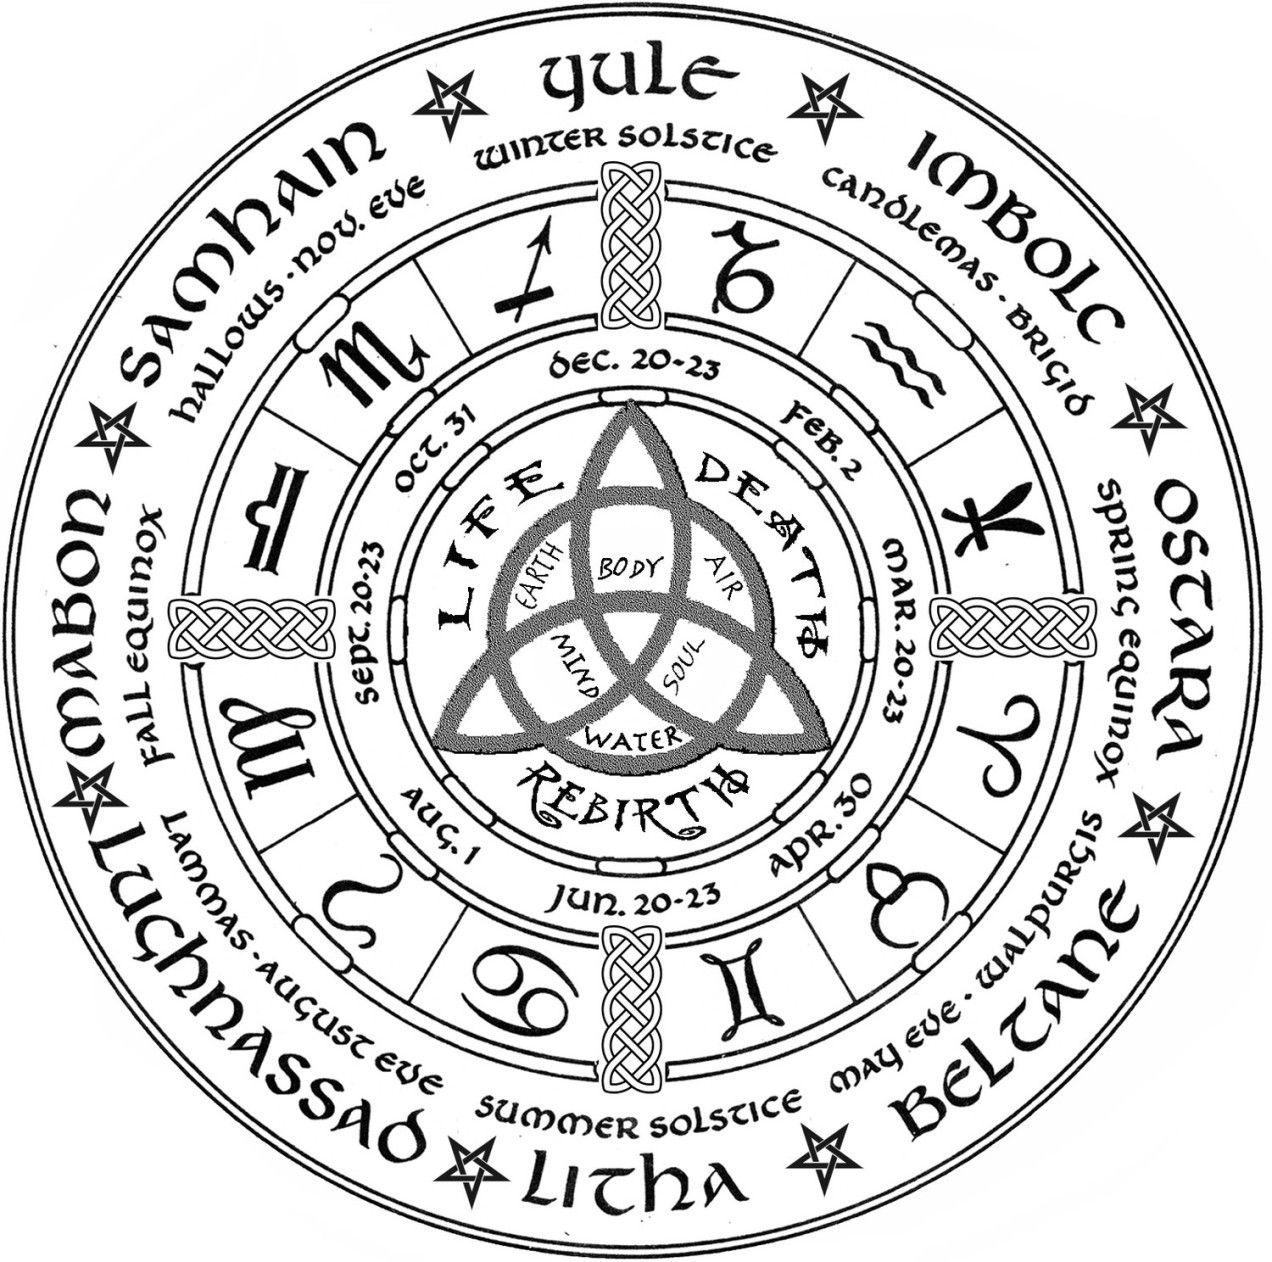 L Arbre Des Sephiroth Daath Et La Traversee De L Abime Symbole Esoterique Livres Des Ombres Symboles Occultes